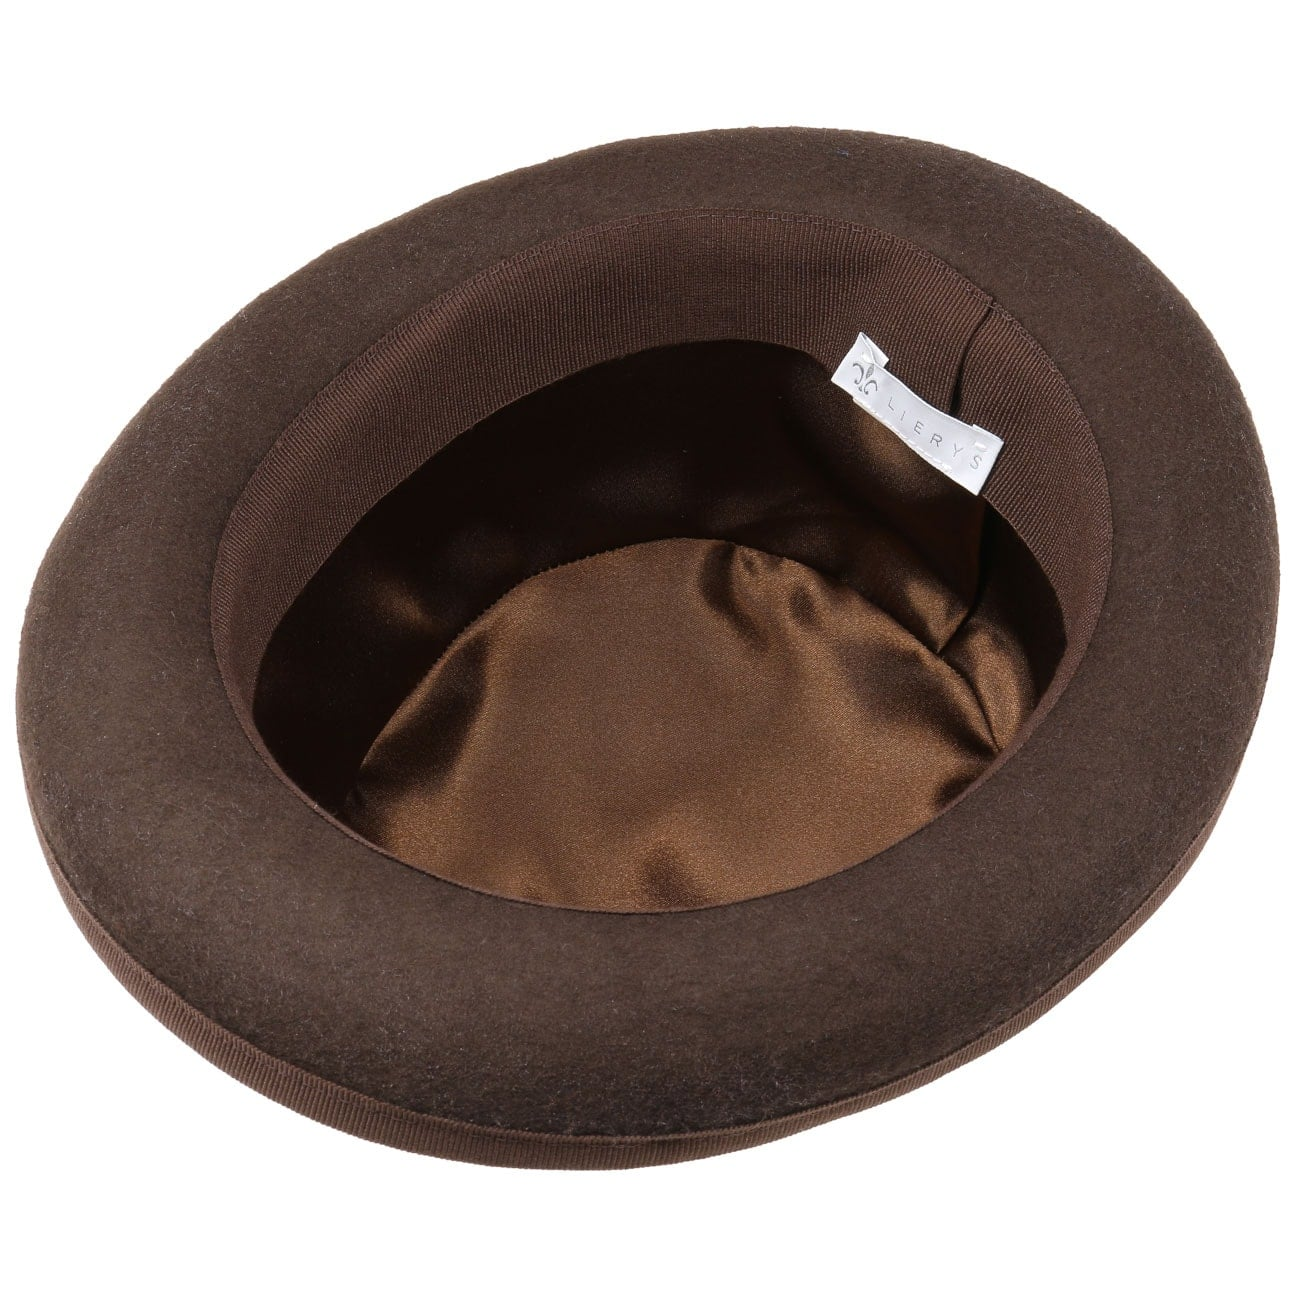 a280c0a8d46c36 ... Wool Felt Bowler Hat Uni by Lierys - blue 3 ...